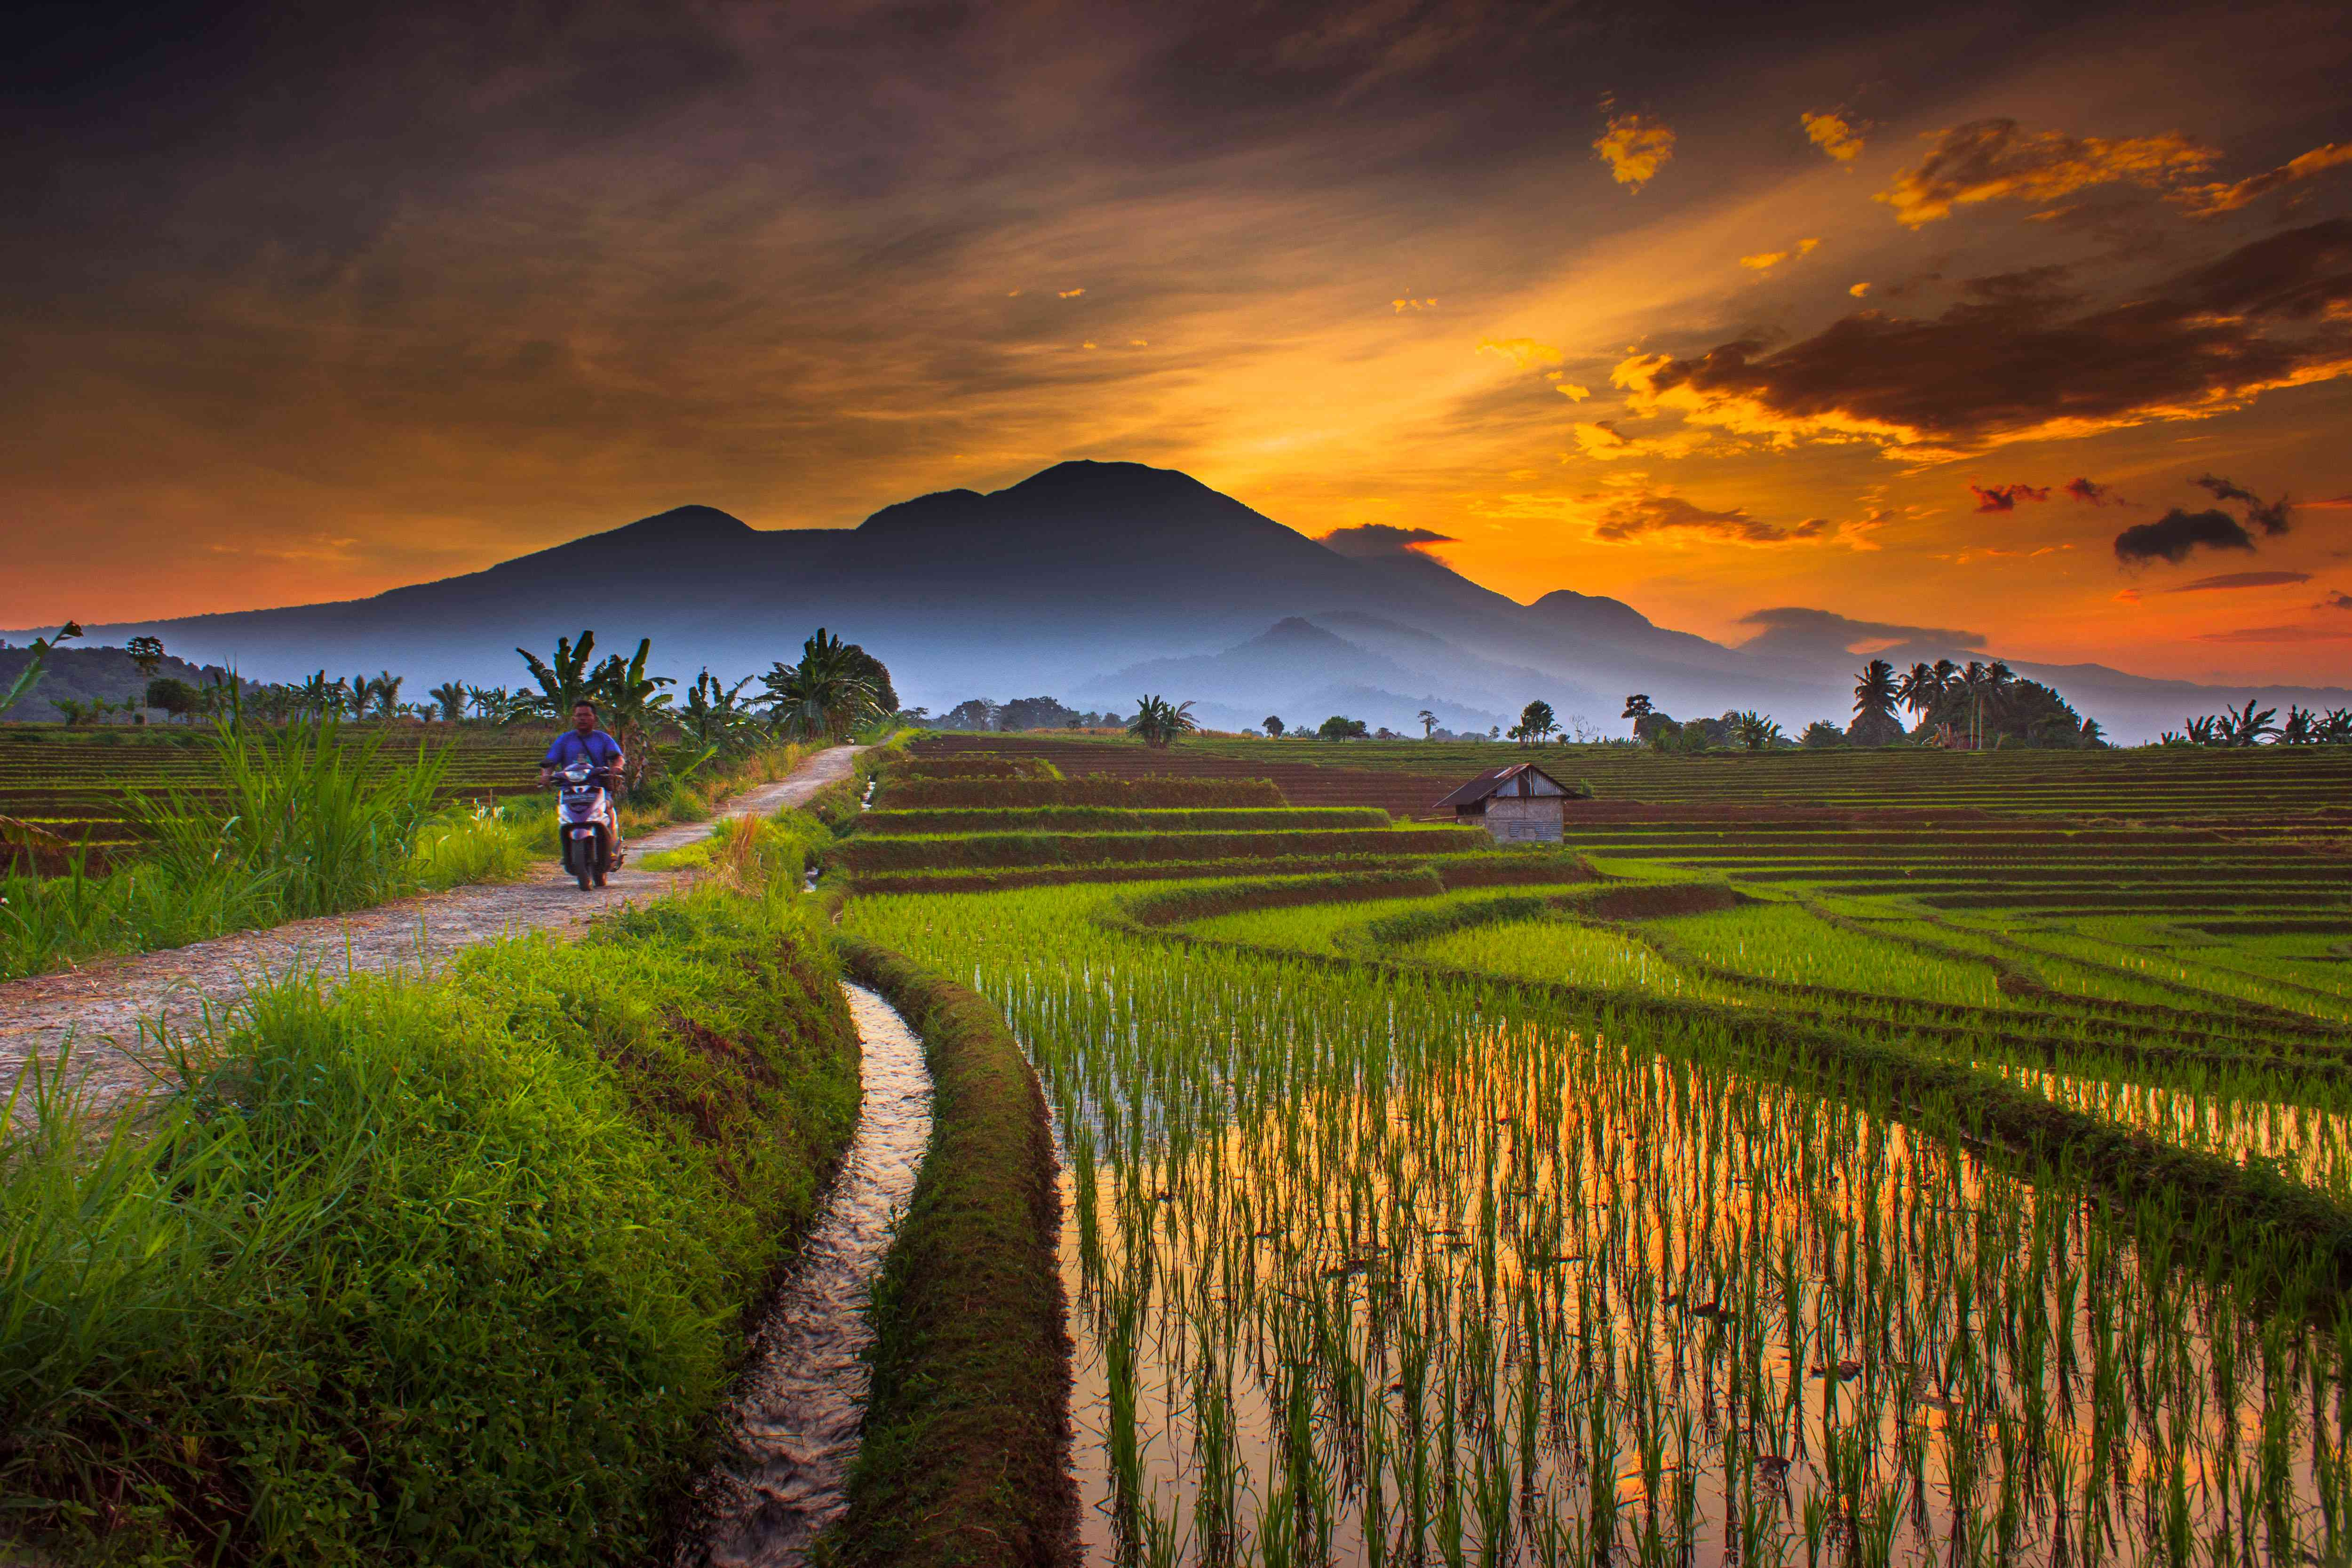 Driving at sunset in Bengkulu, South Sumatra